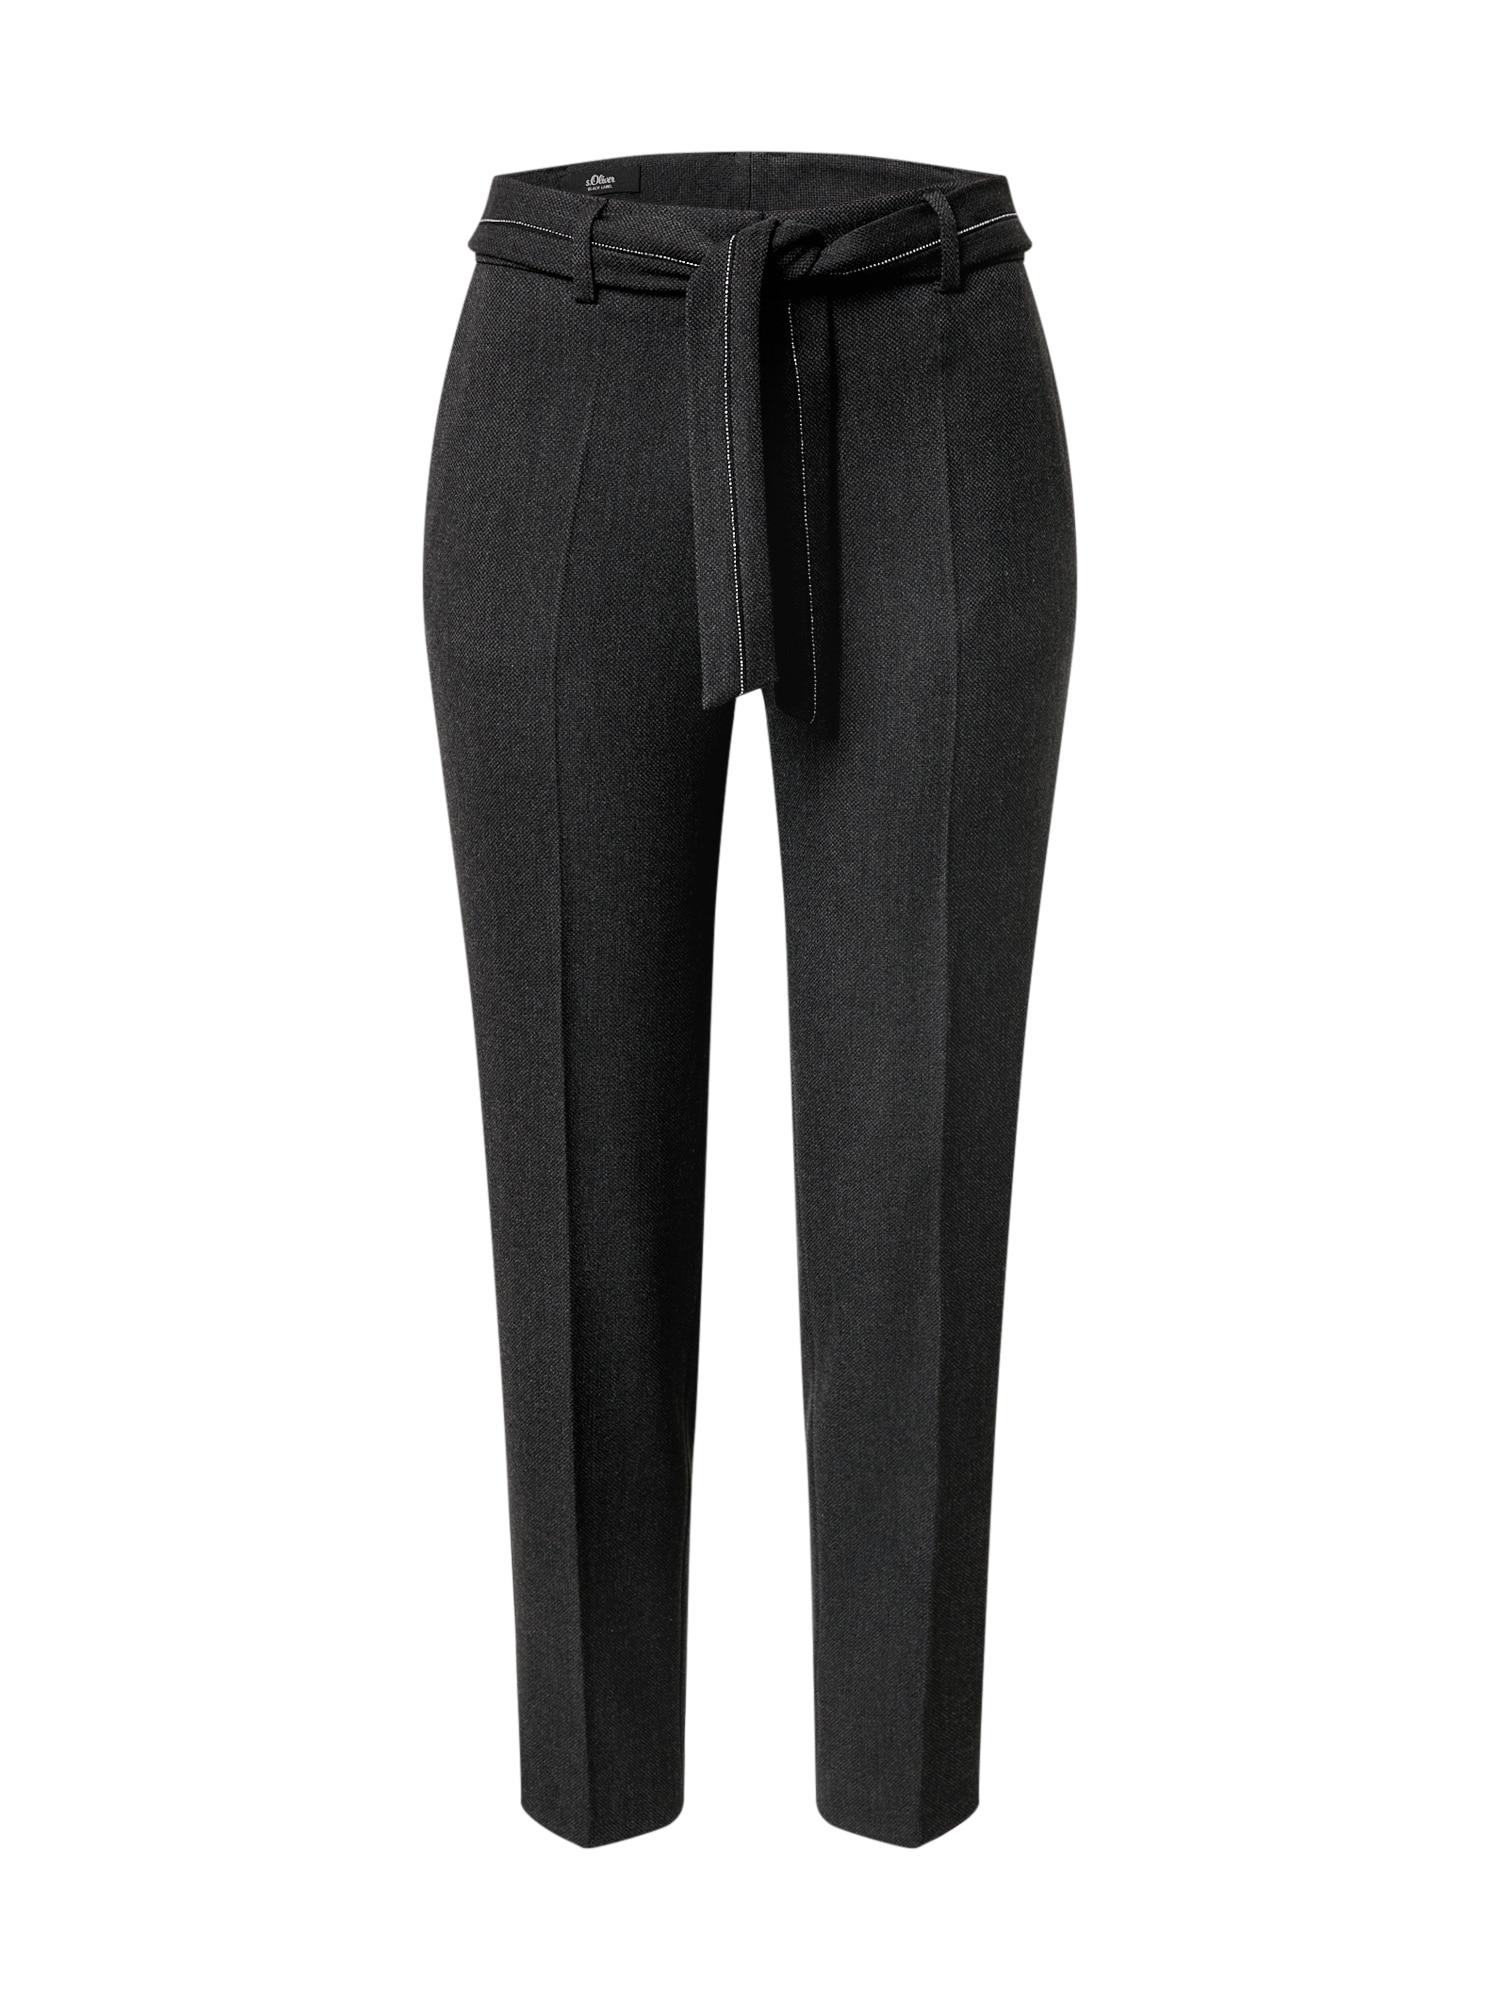 s.Oliver BLACK LABEL Kelnės su kantu tamsiai pilka